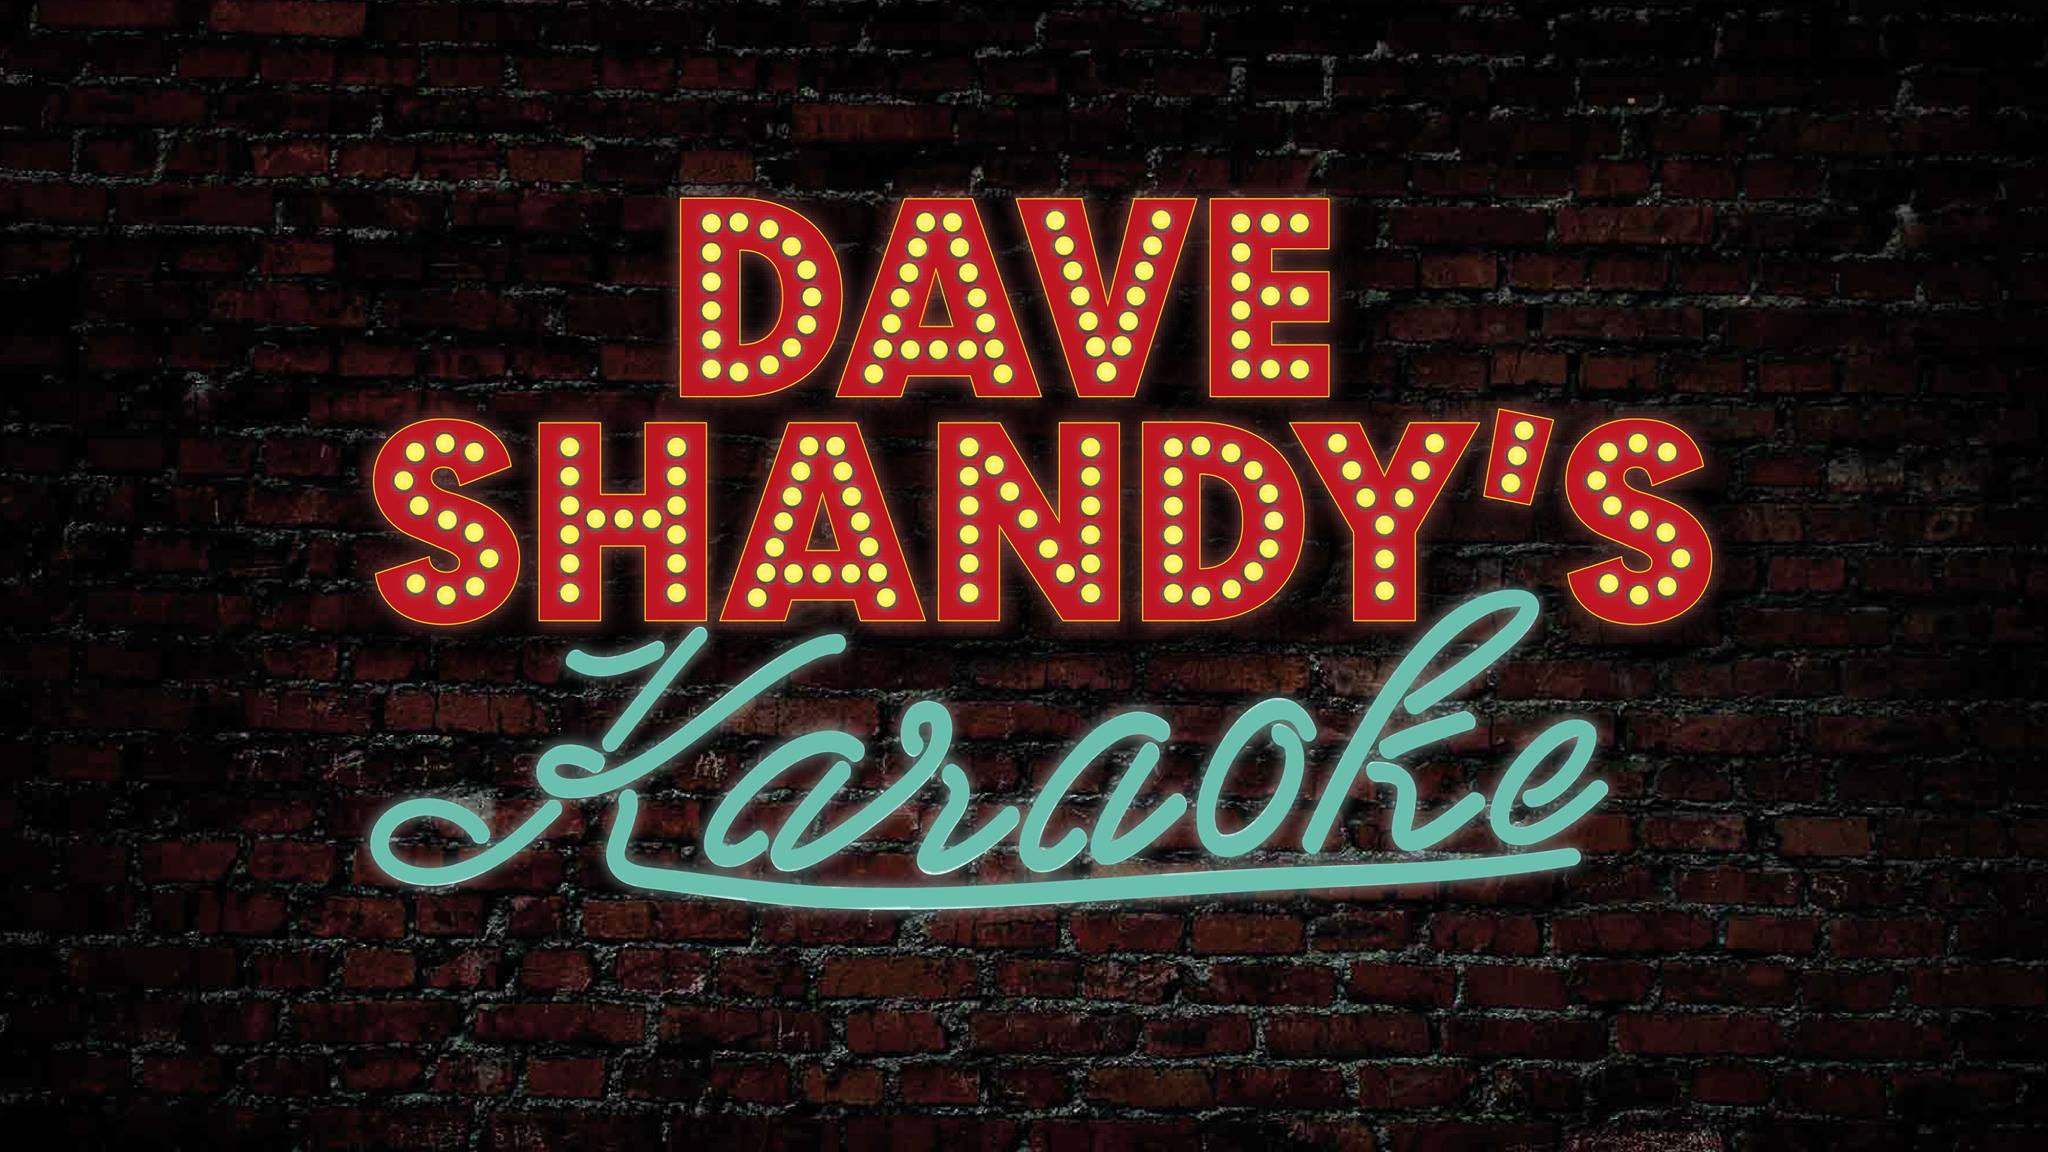 Dave Shandy's Late Night Karaoke